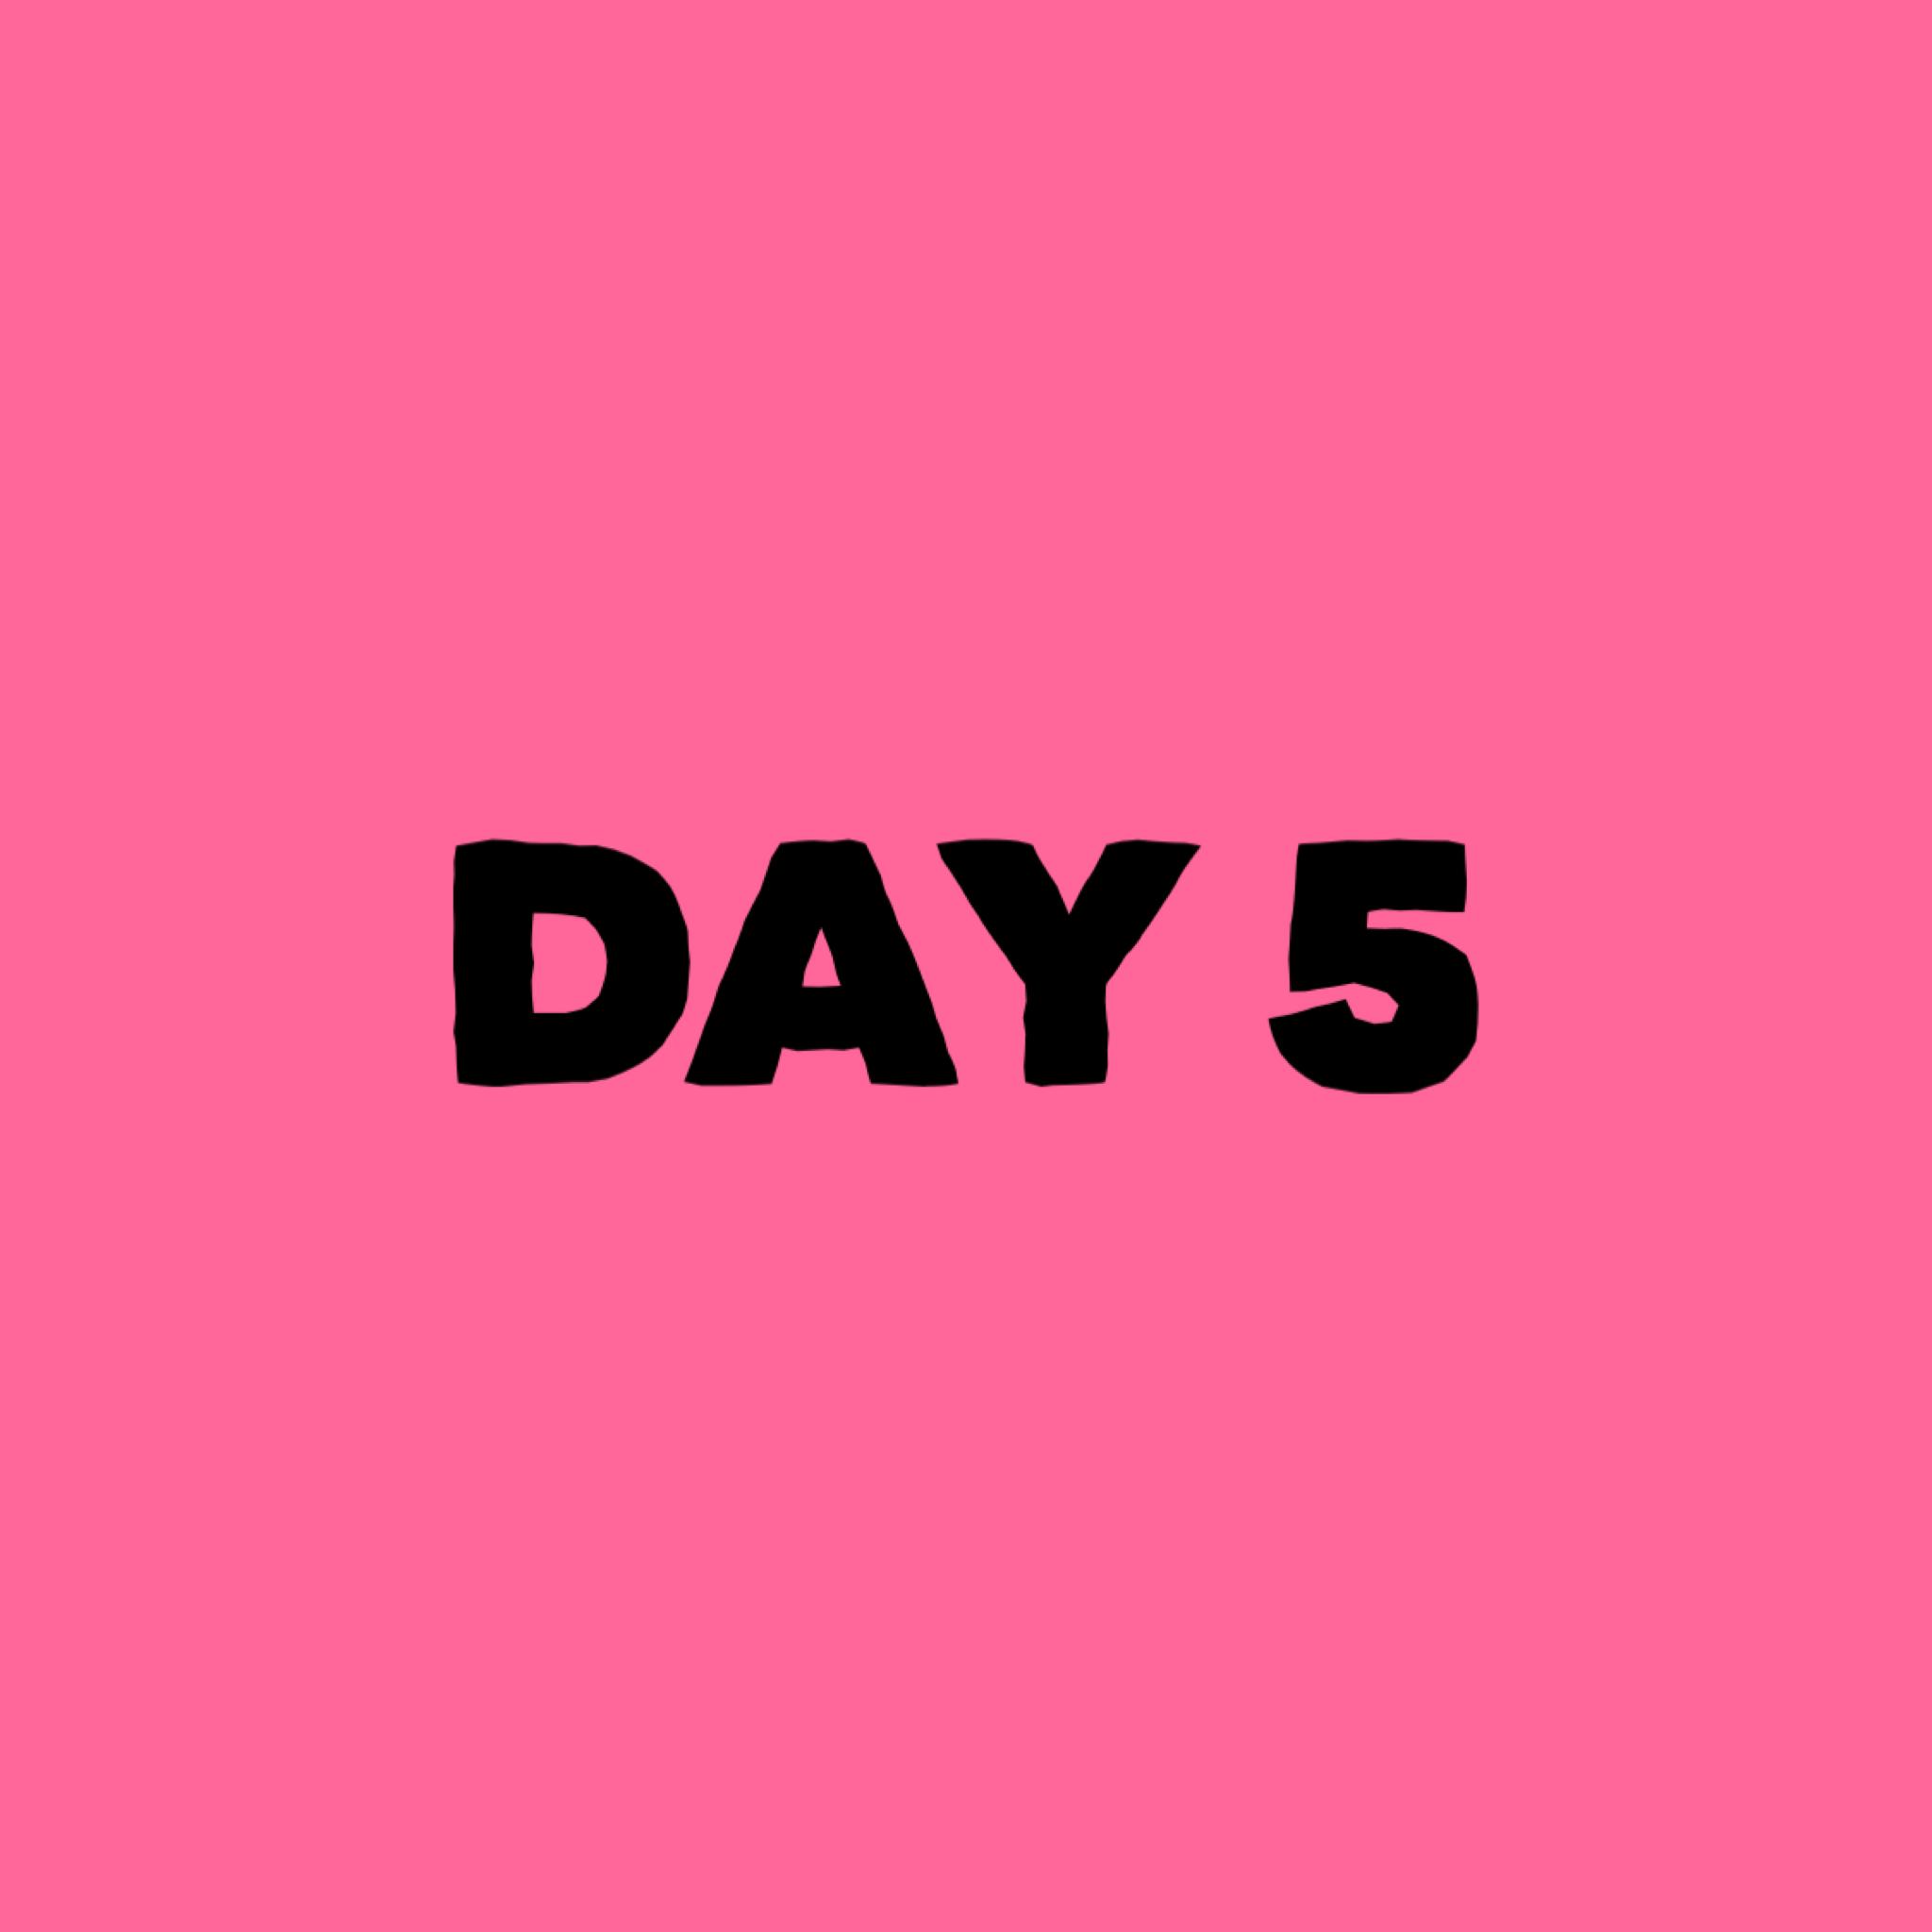 Day 5 of Abundance